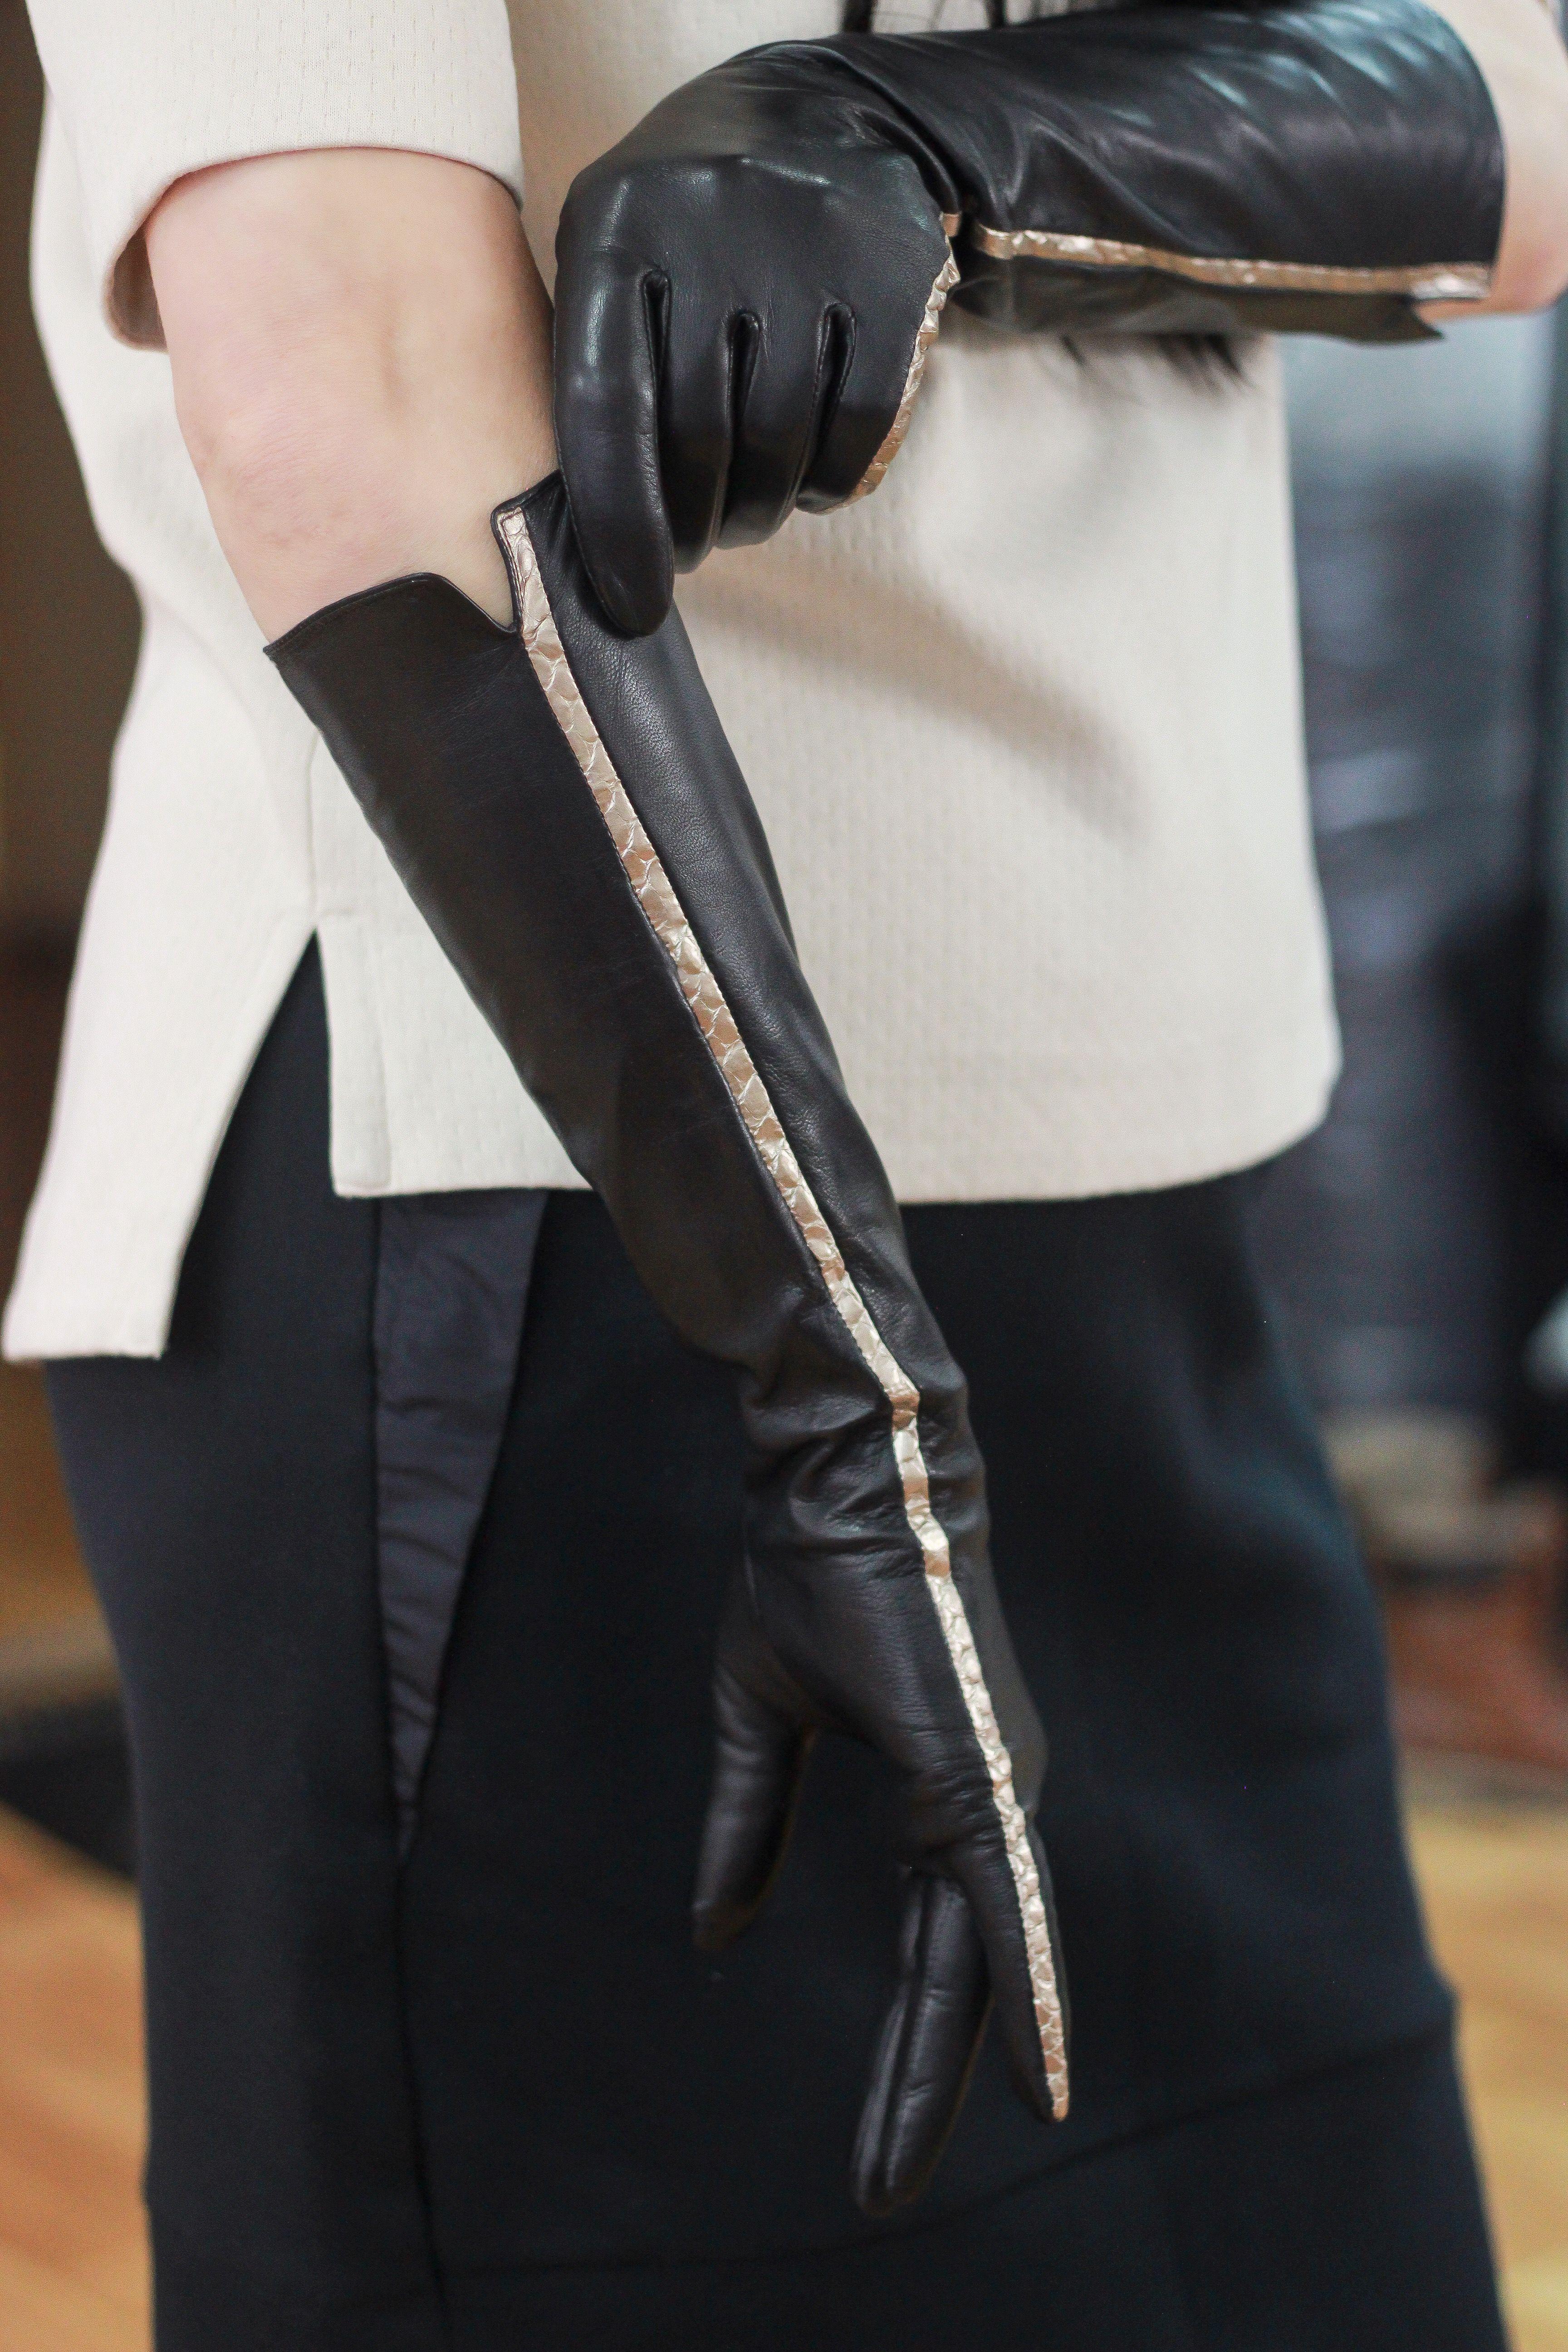 60cm Full Sleeve Under Arm Genuine Leather Runway Fashion Noir Mourn Opera Glove